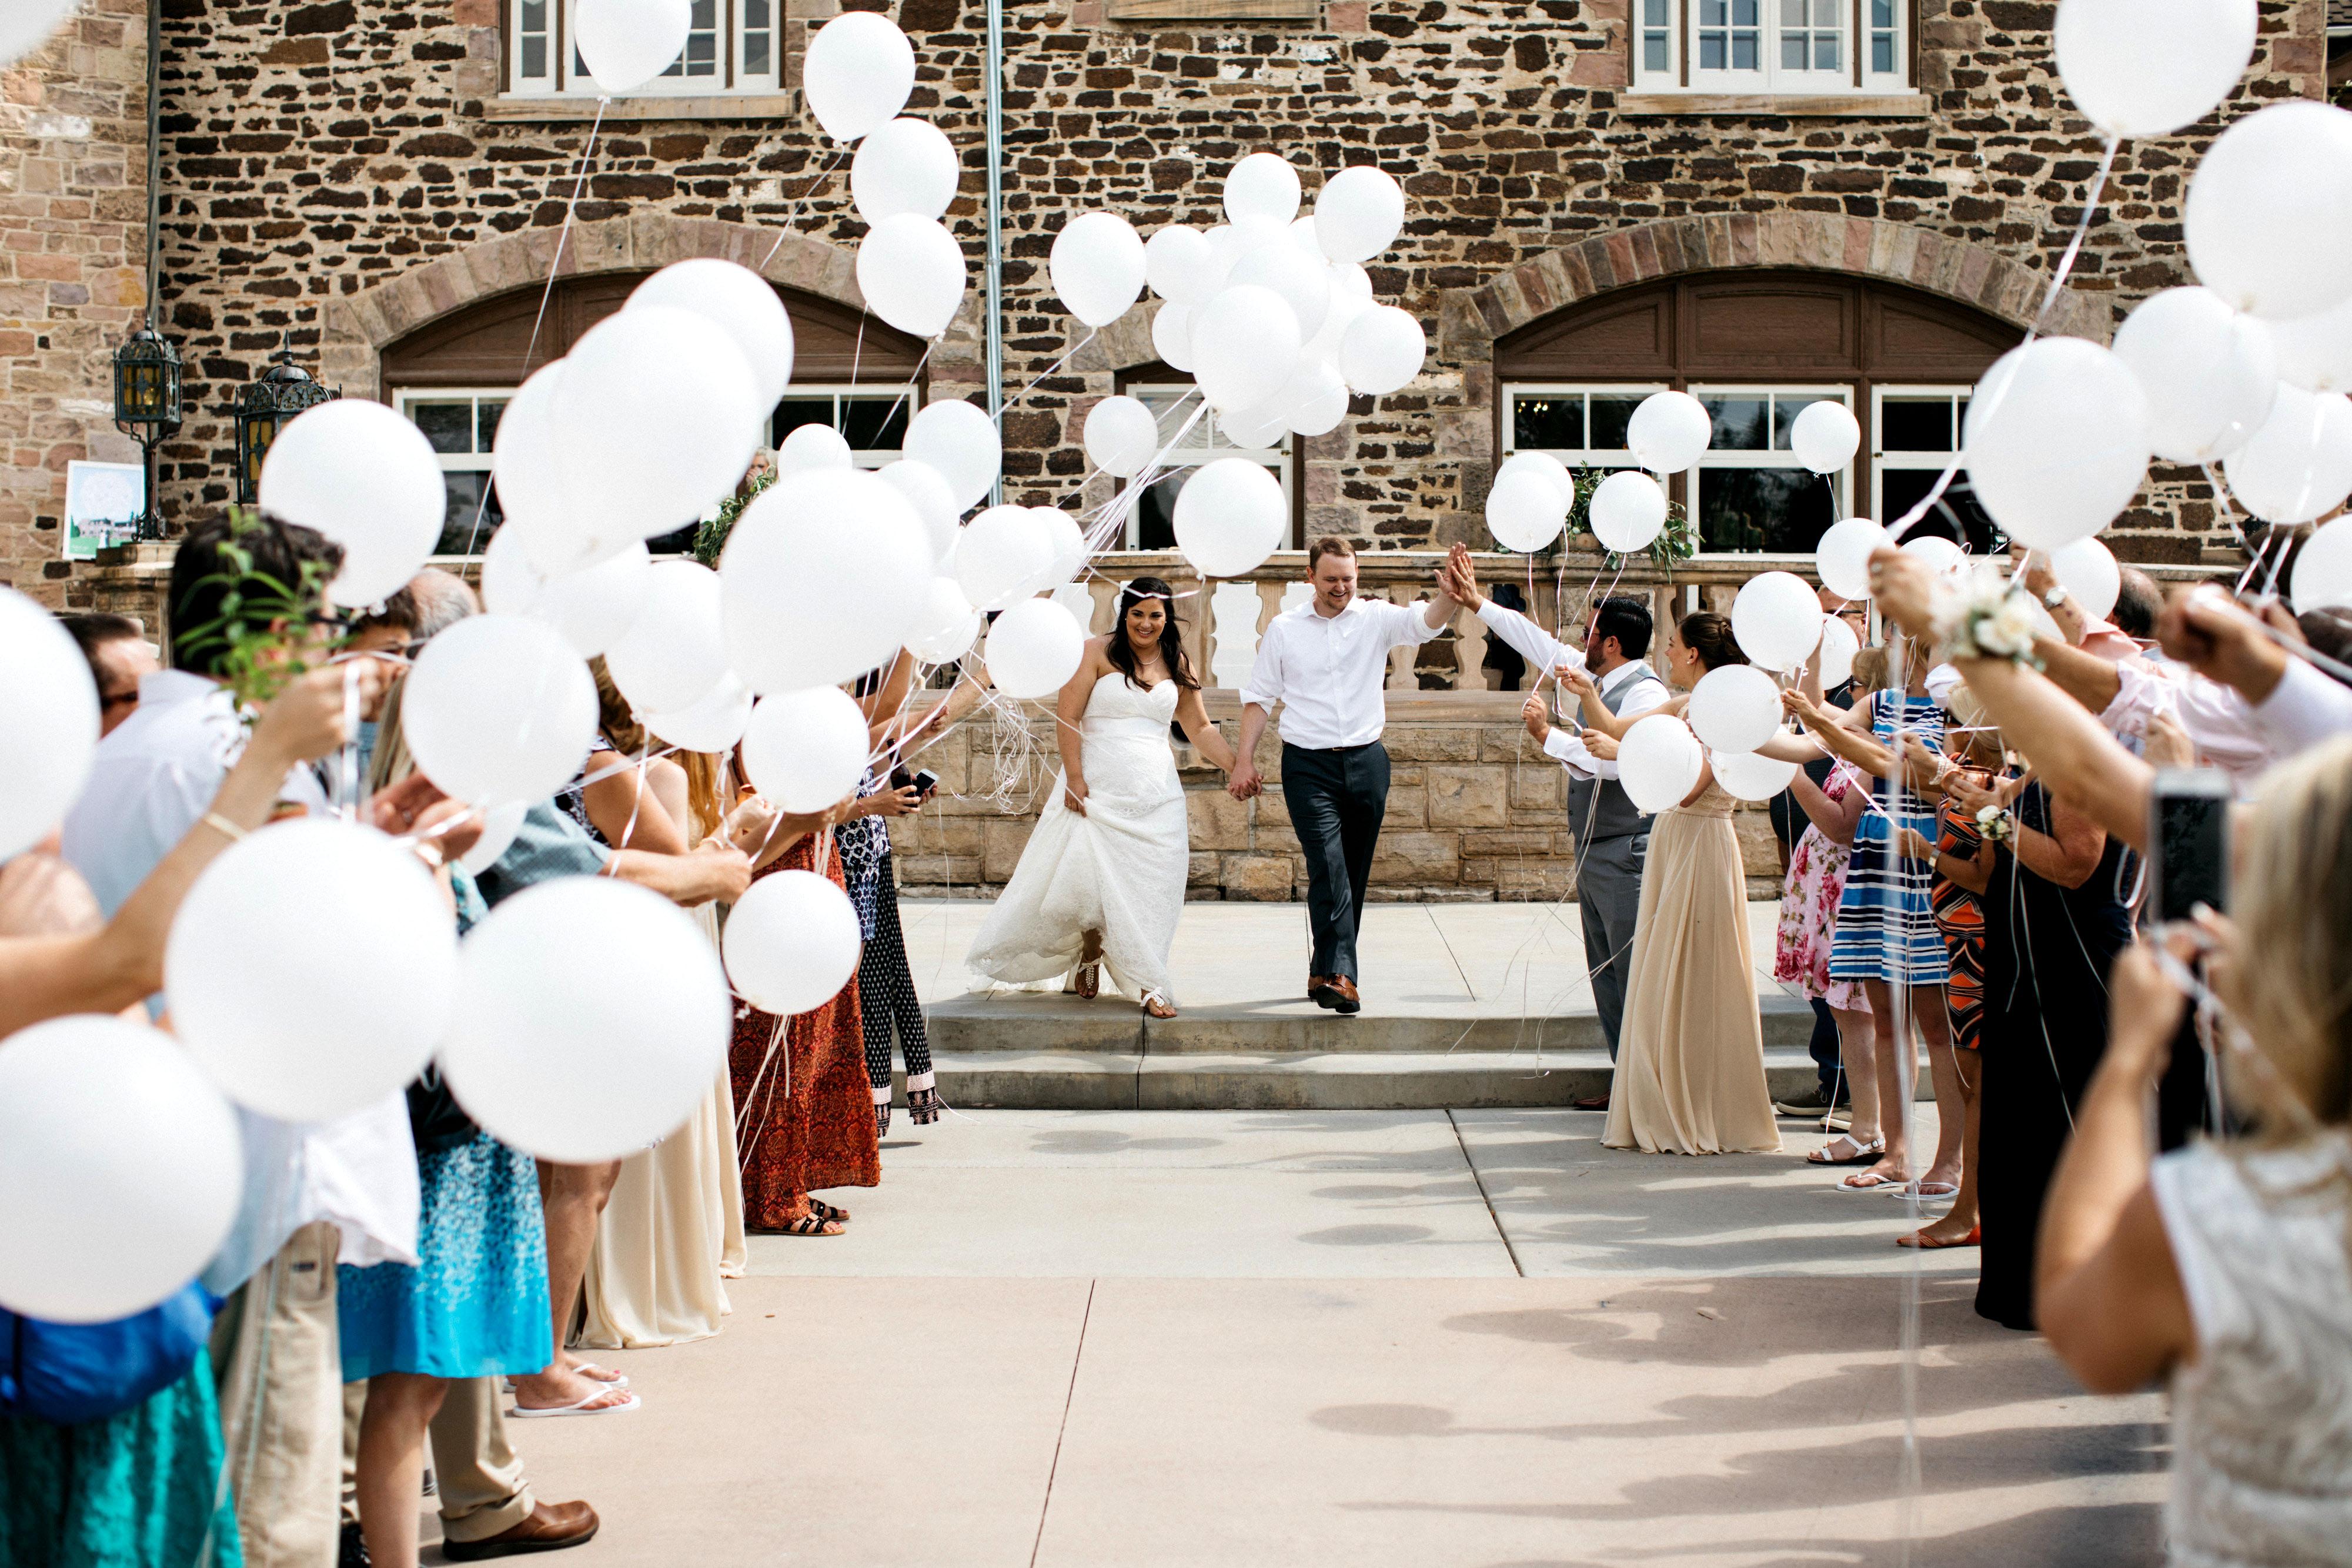 wedding exits balloons sharee davenport